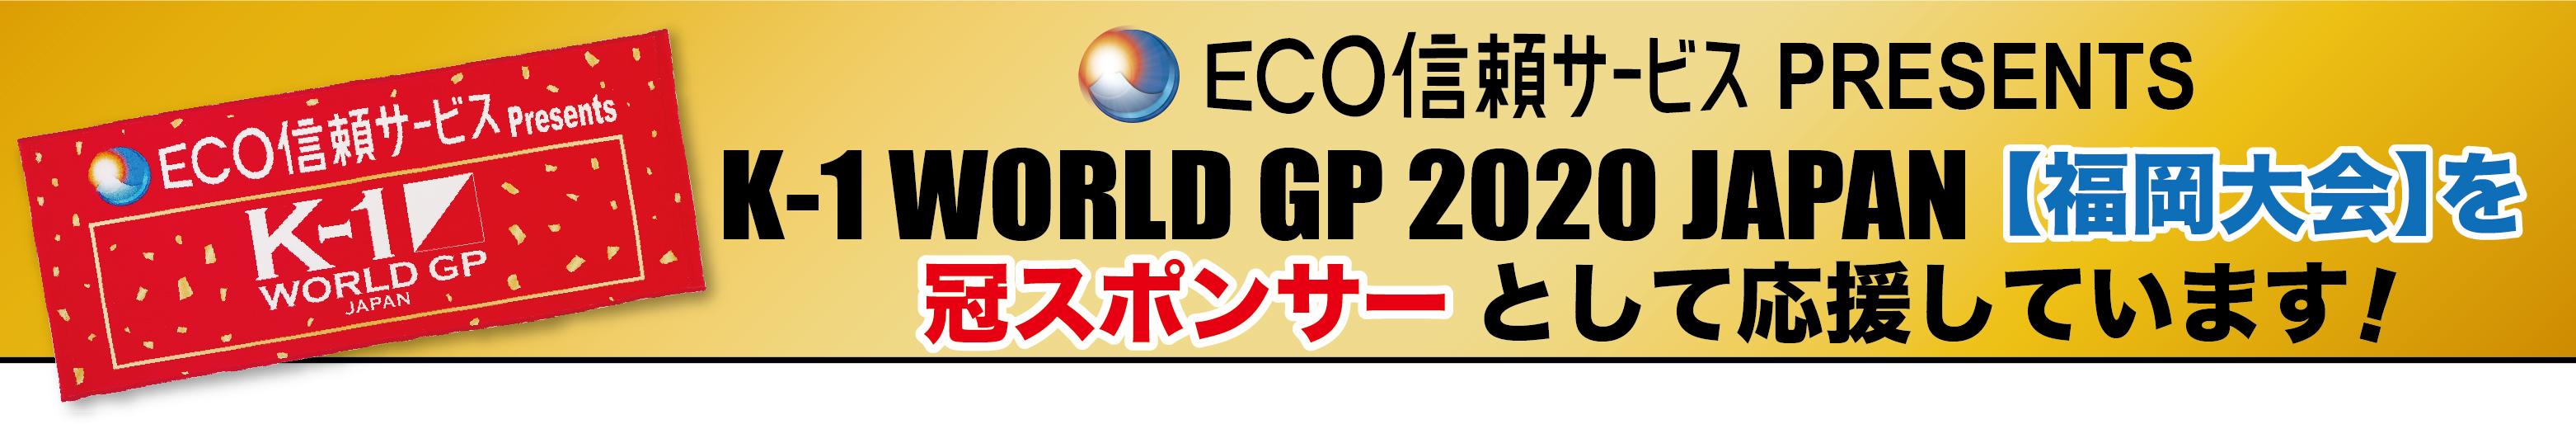 ECO信頼サービス株式会社 PRESENTS K-1 WORLD GP 2020 JAPAN 開催決定!